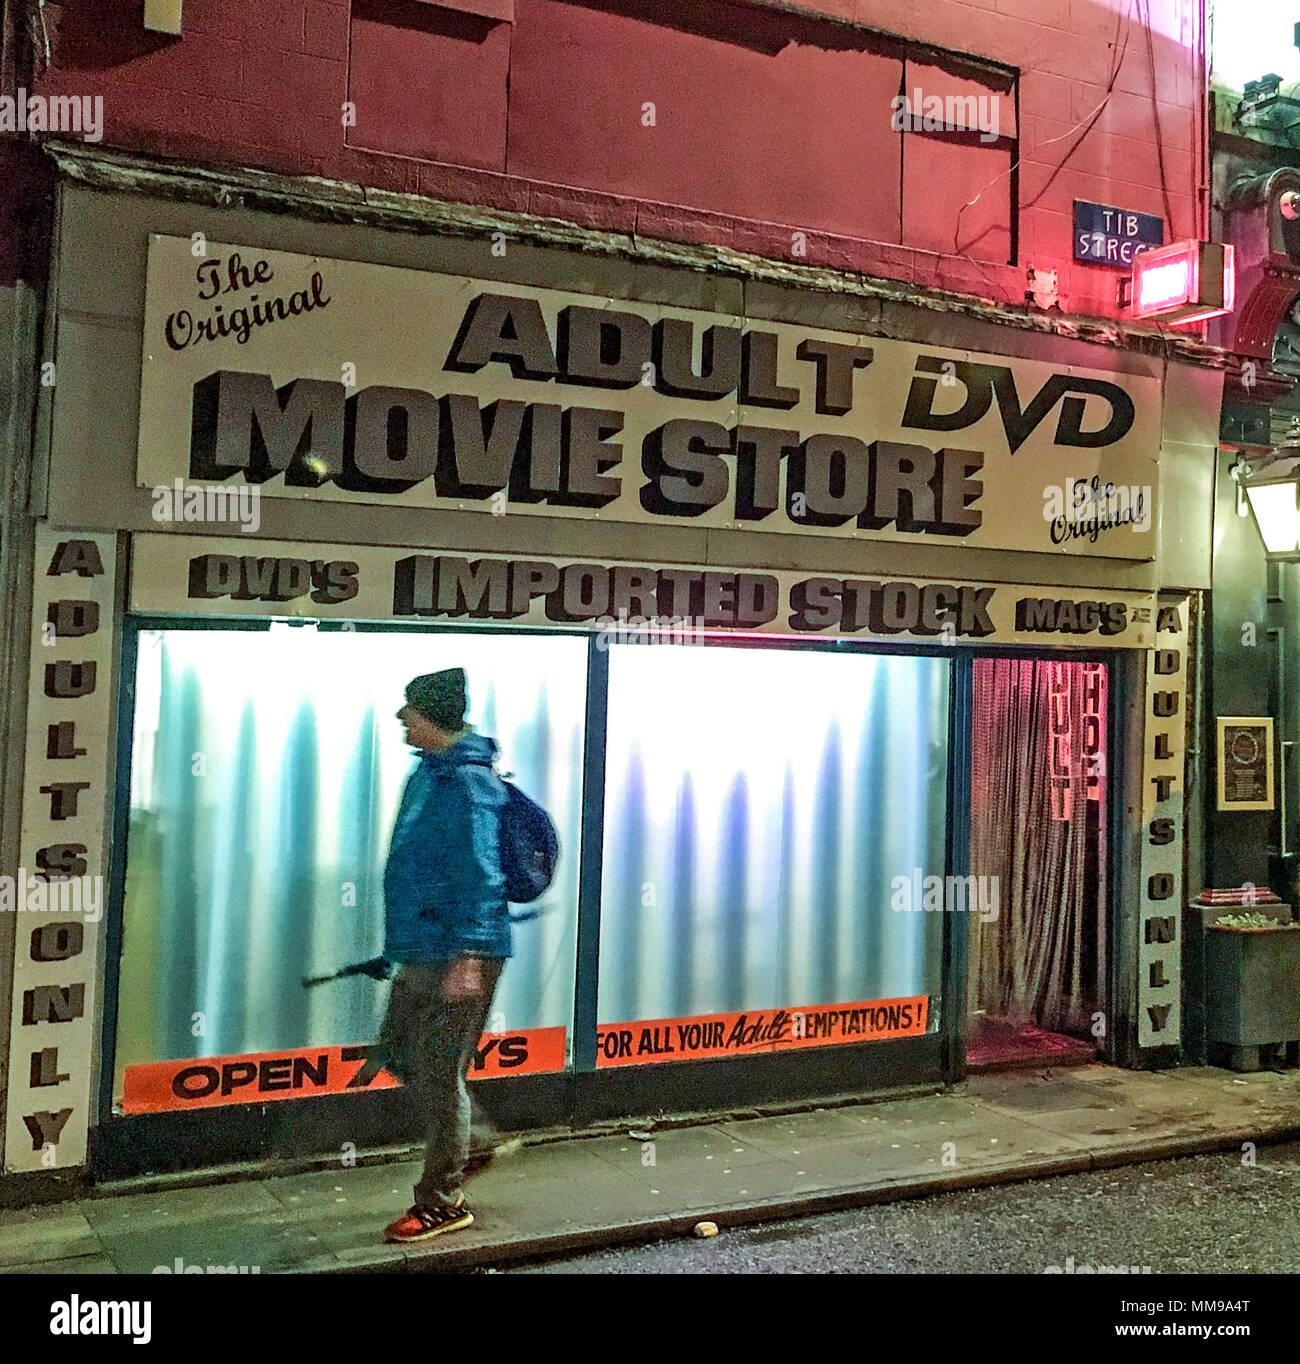 GoTonysmith,@HotpixUK,Adult,DVD,Movie